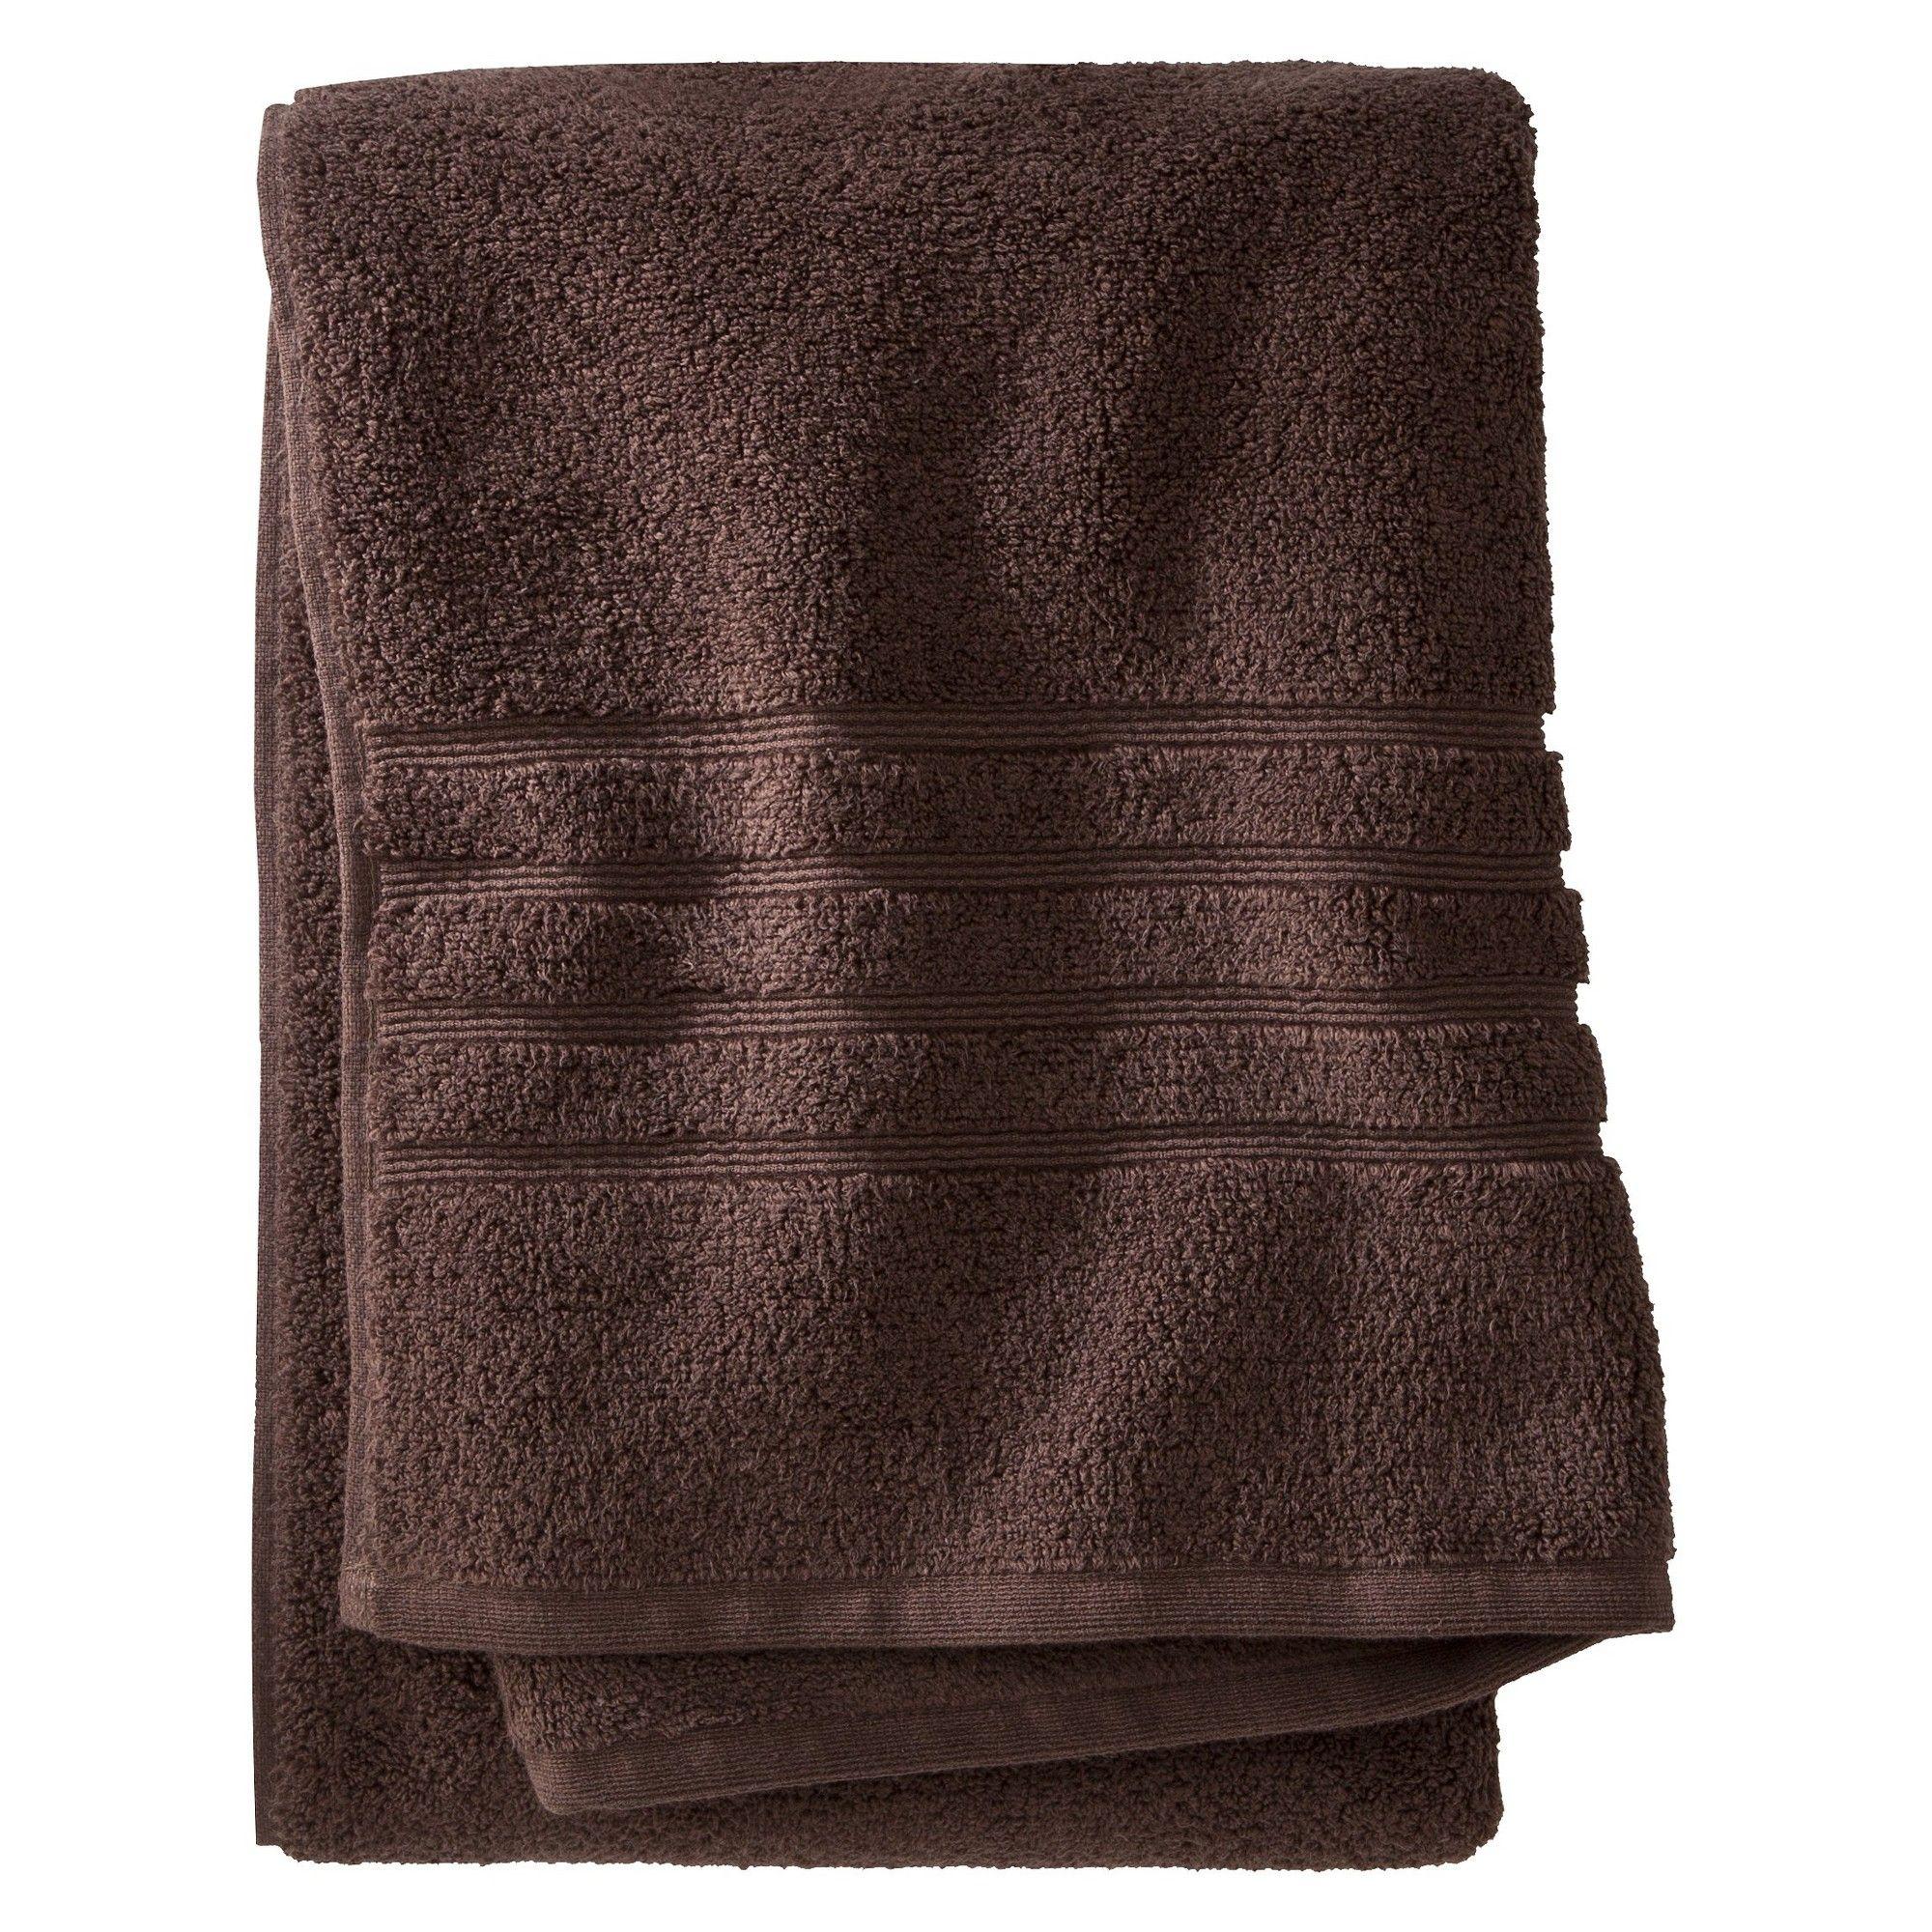 Bath Sheets Target Luxury Bath Towel Morel Brown  Fieldcrest  Luxury Bath Towels And